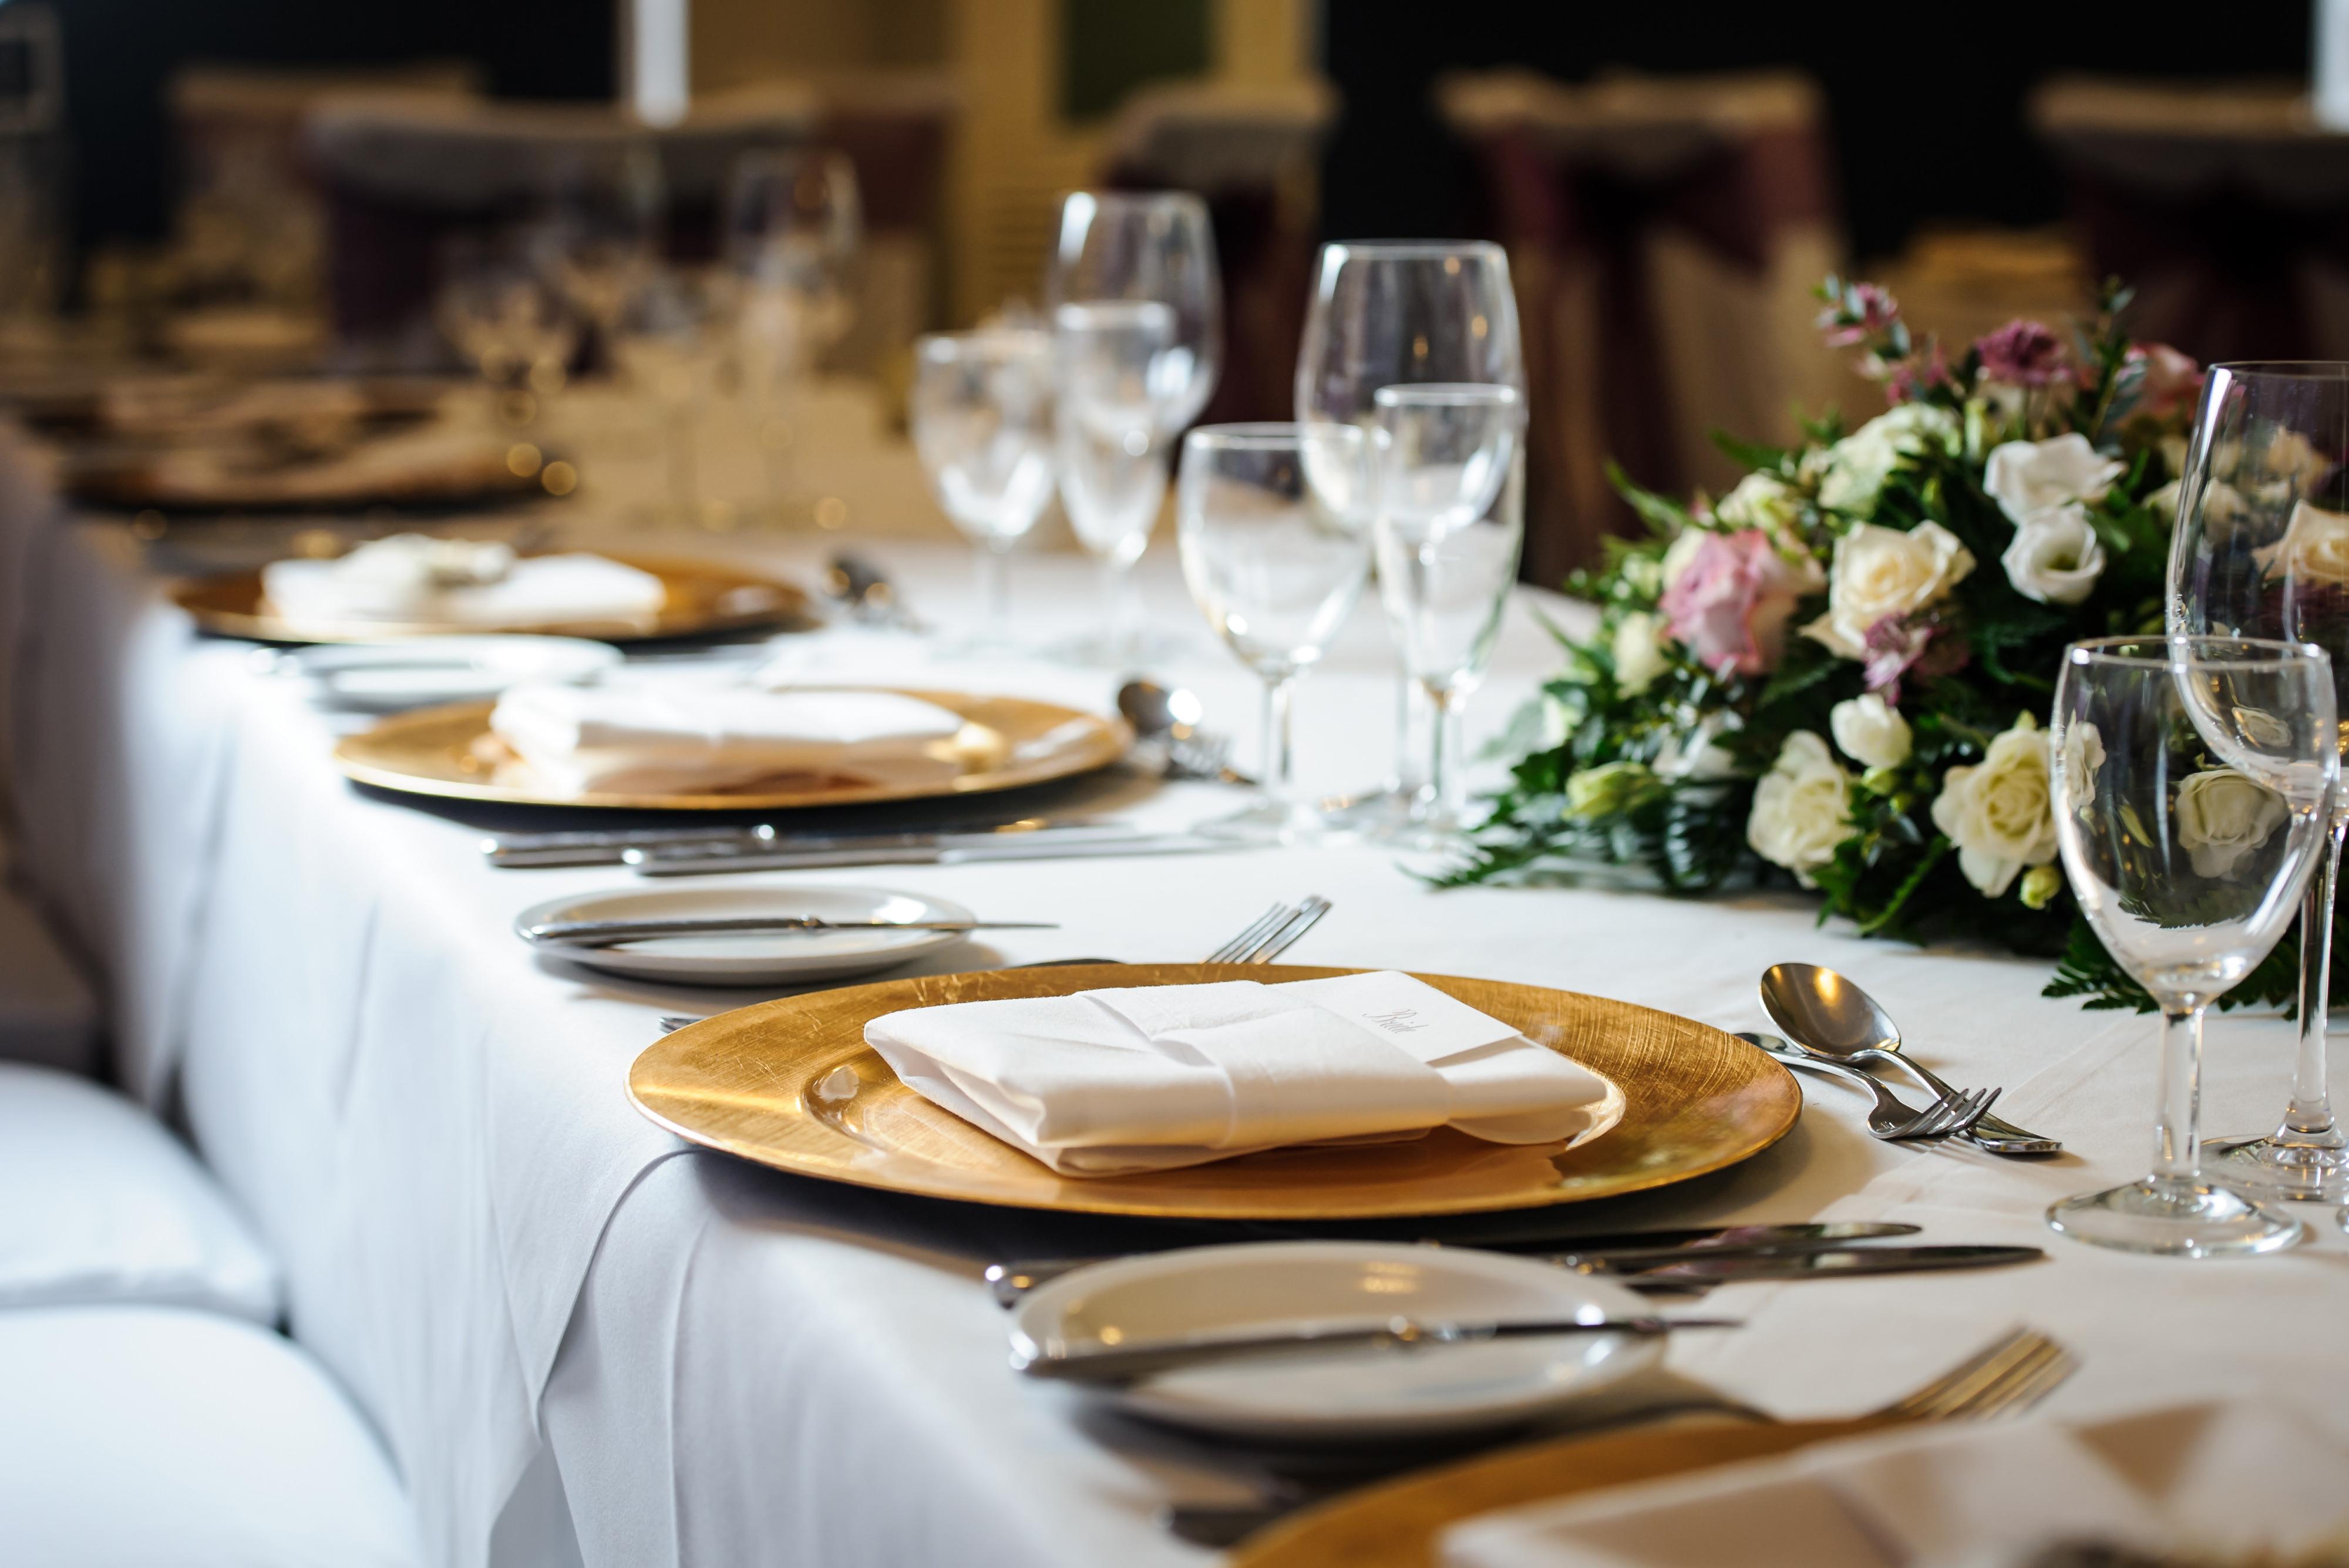 rmw rates lily king weddings of distinction east midlands. Black Bedroom Furniture Sets. Home Design Ideas